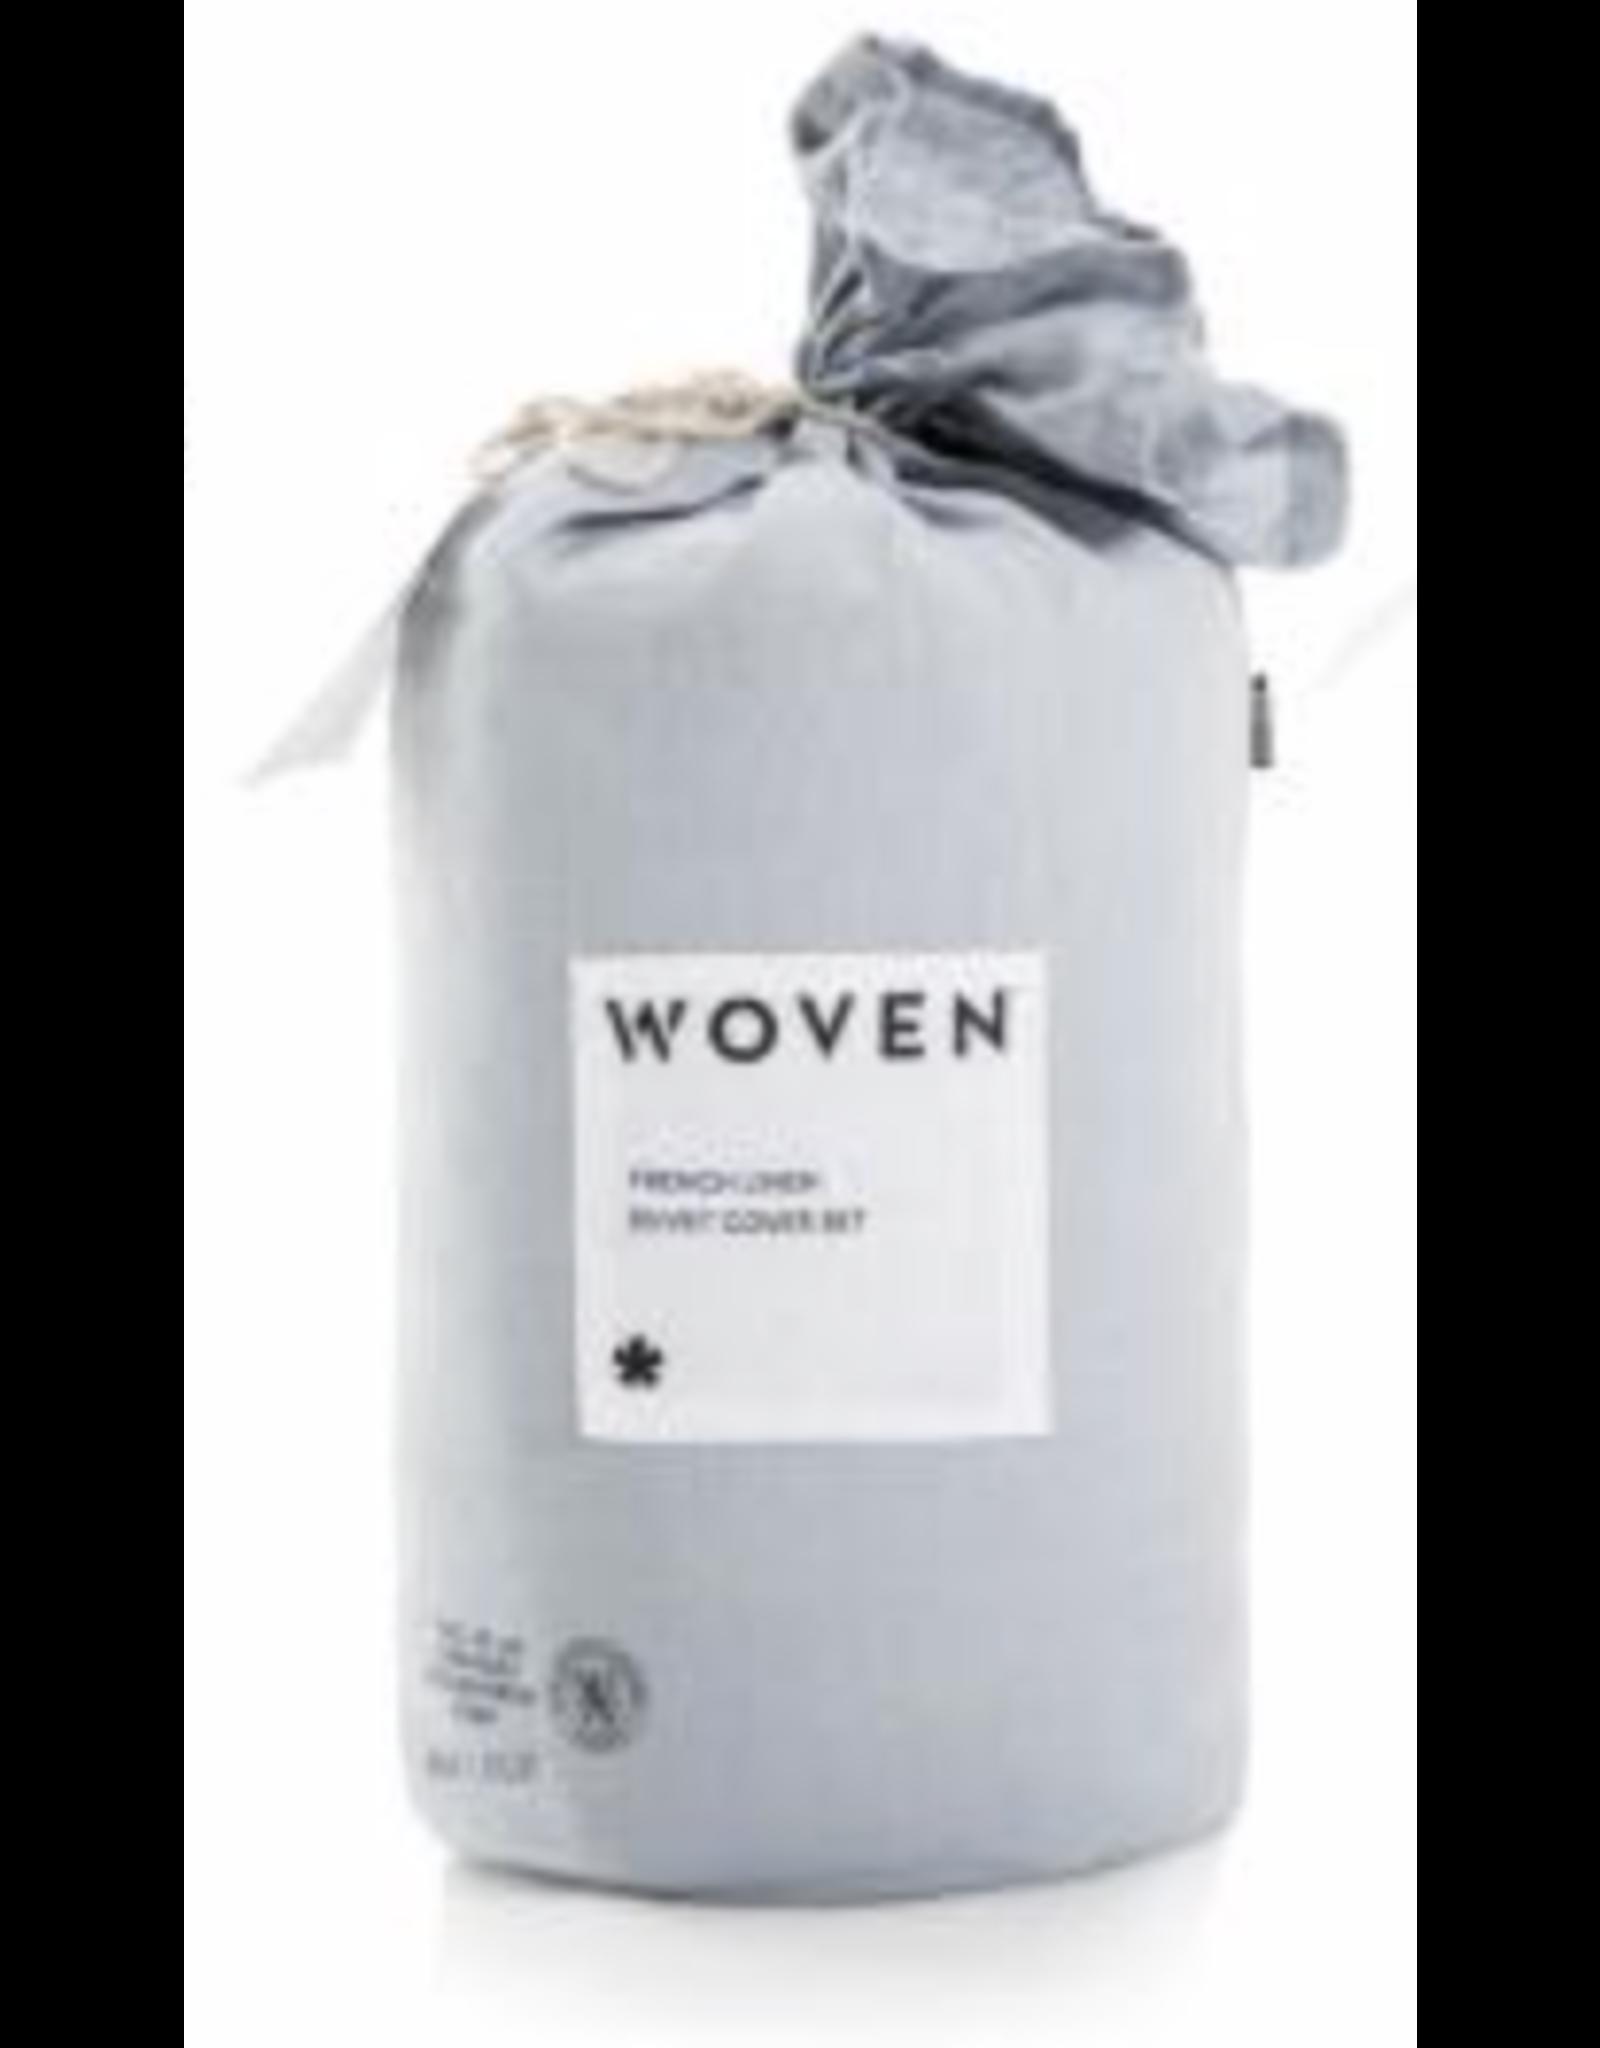 Woven French Linen Duvet Cover, Queen, Smoke